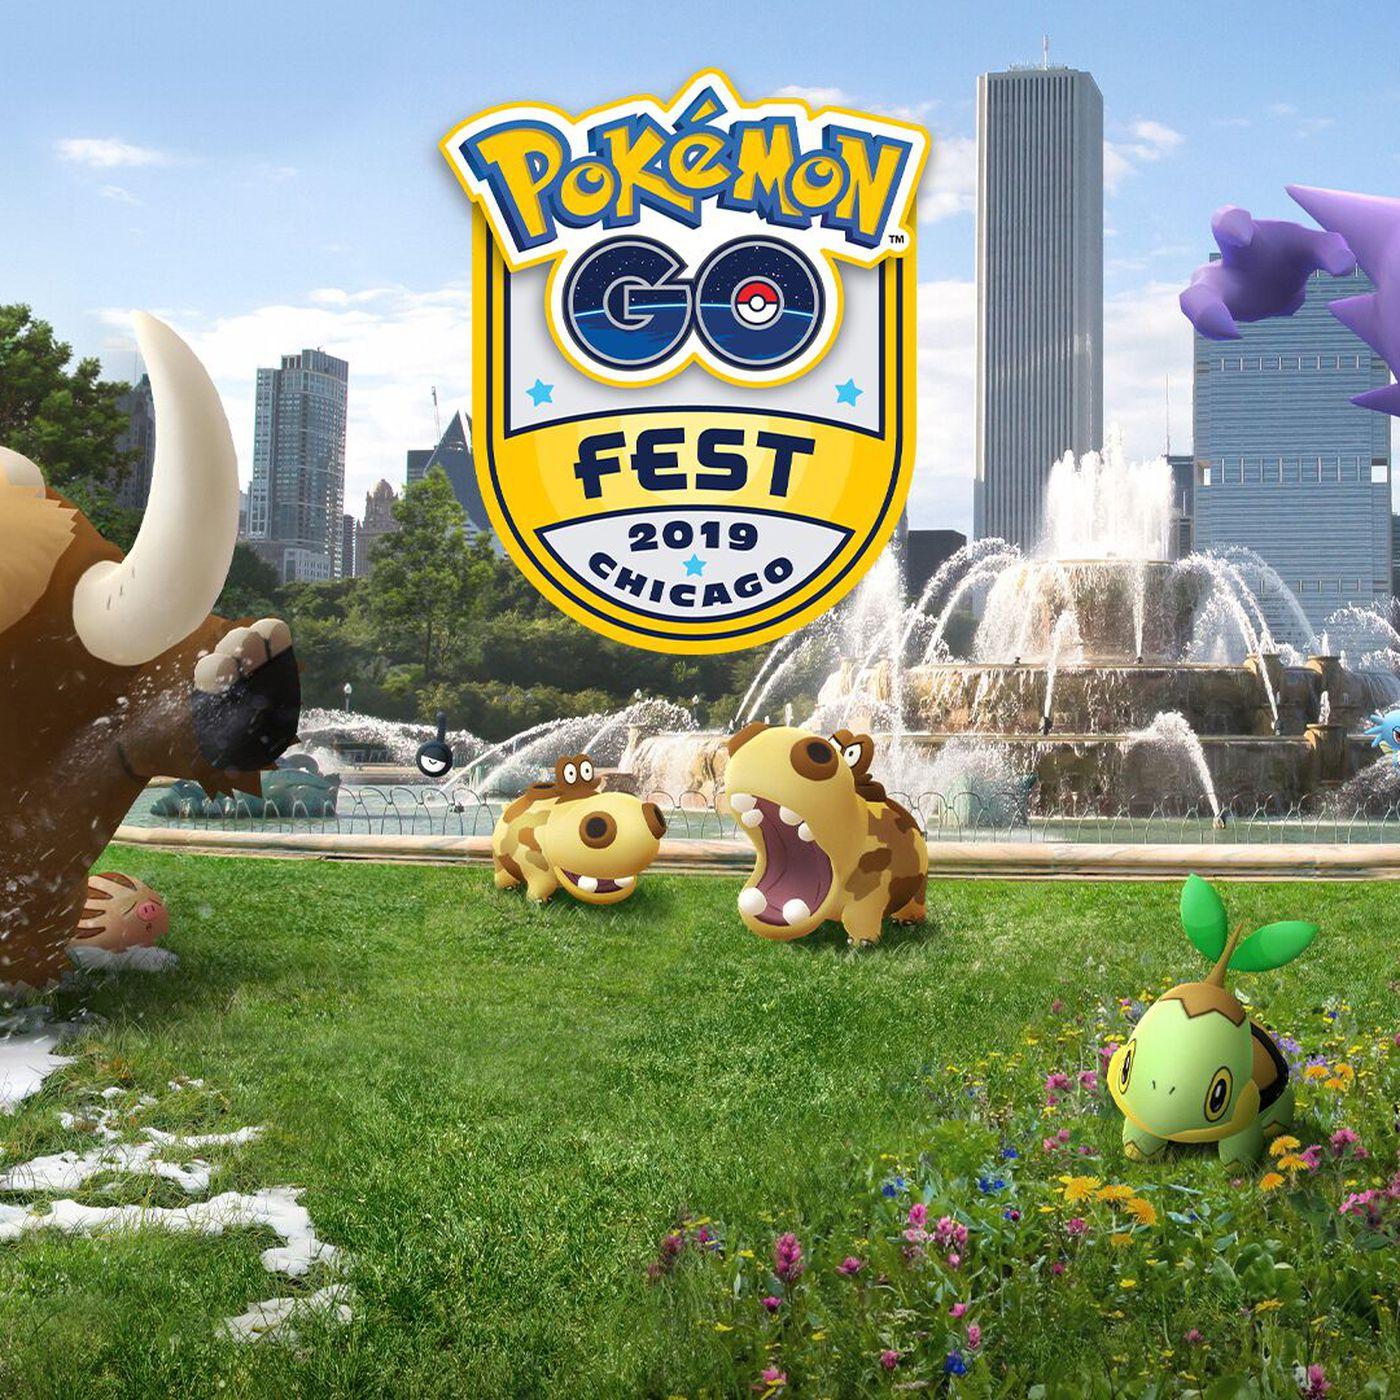 Pokémon Go Fest 2019: dates, cities, and ticket sales announced